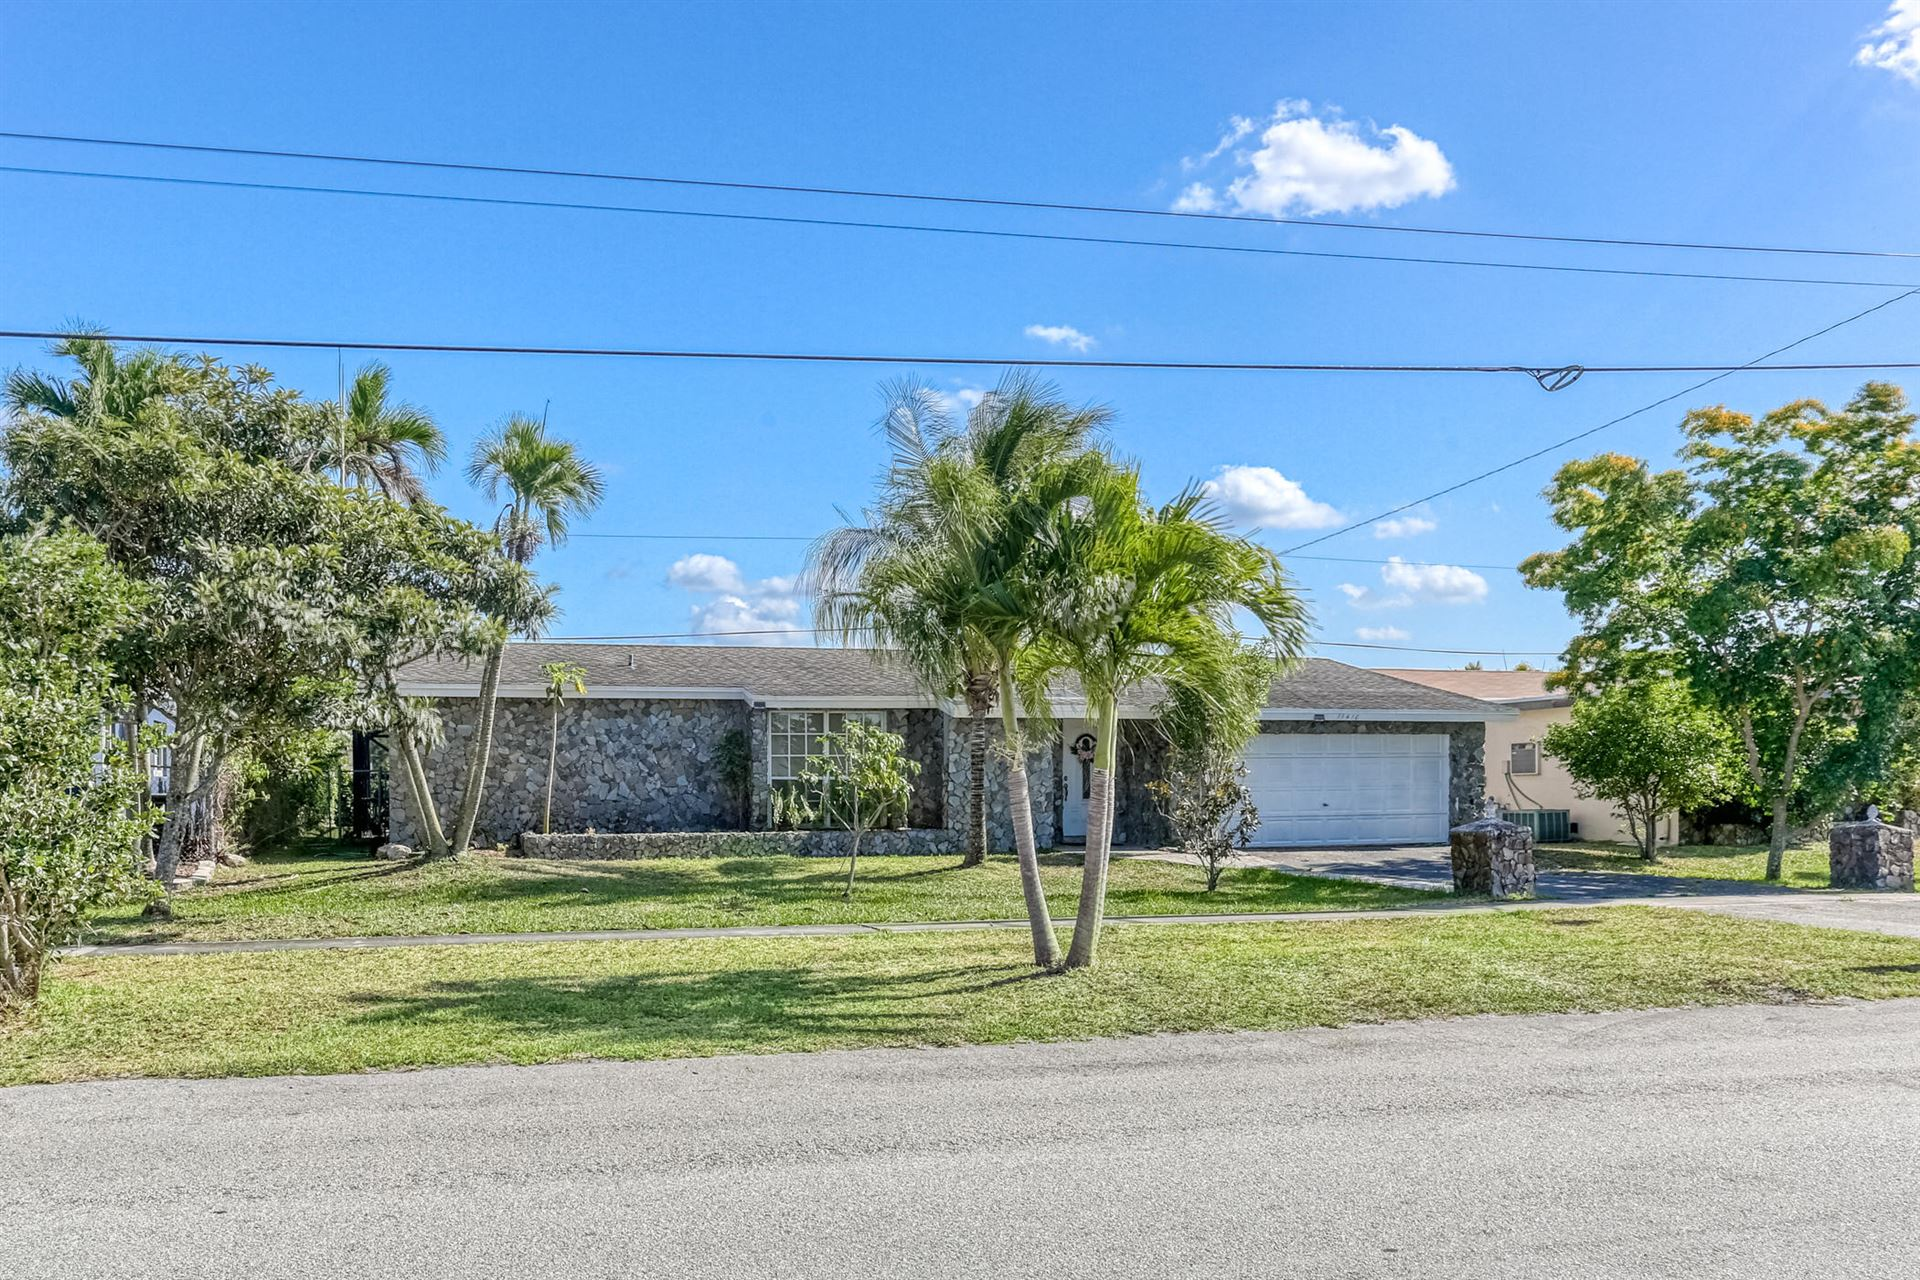 Photo of 11410 NW 29th Manor, Sunrise, FL 33323 (MLS # RX-10713794)